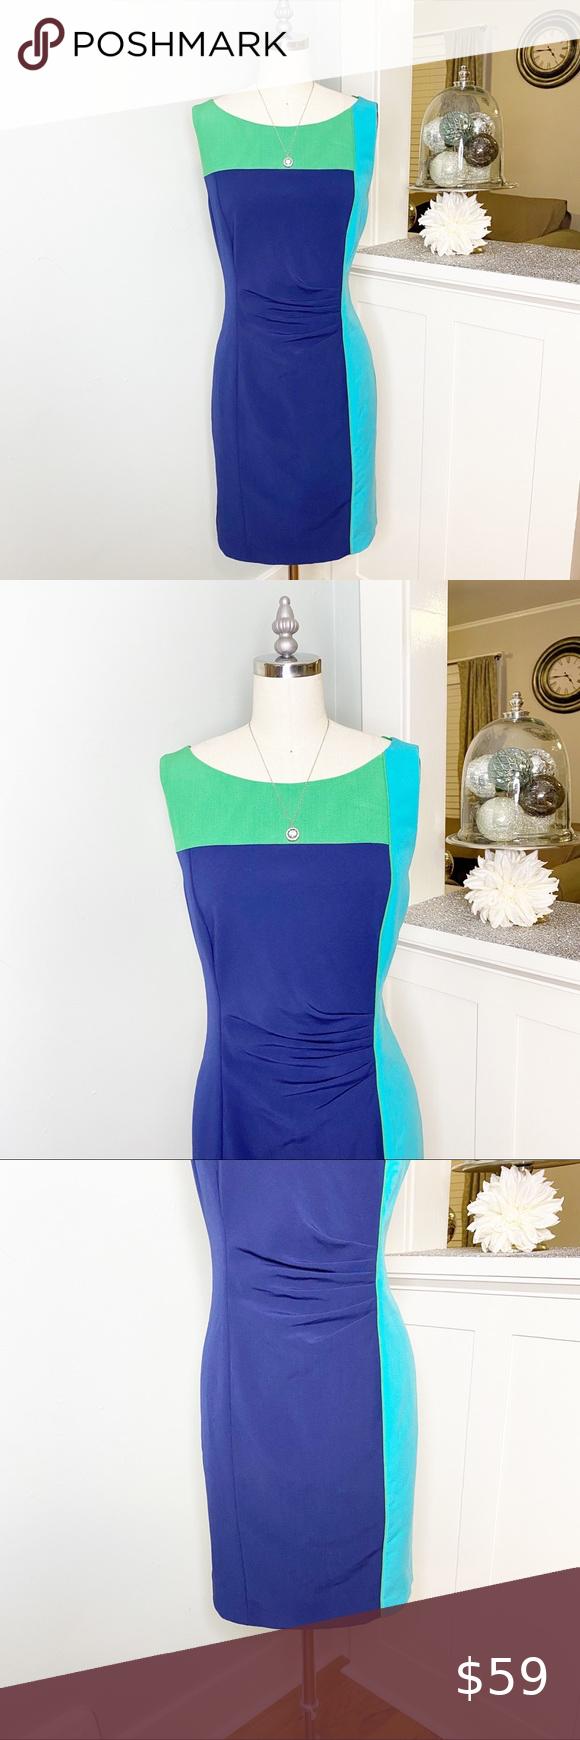 Vince Camuto Navy Green Colorblock Sheath Dress Navy And Green Stretchy Dress Sheath Dress [ 1740 x 580 Pixel ]